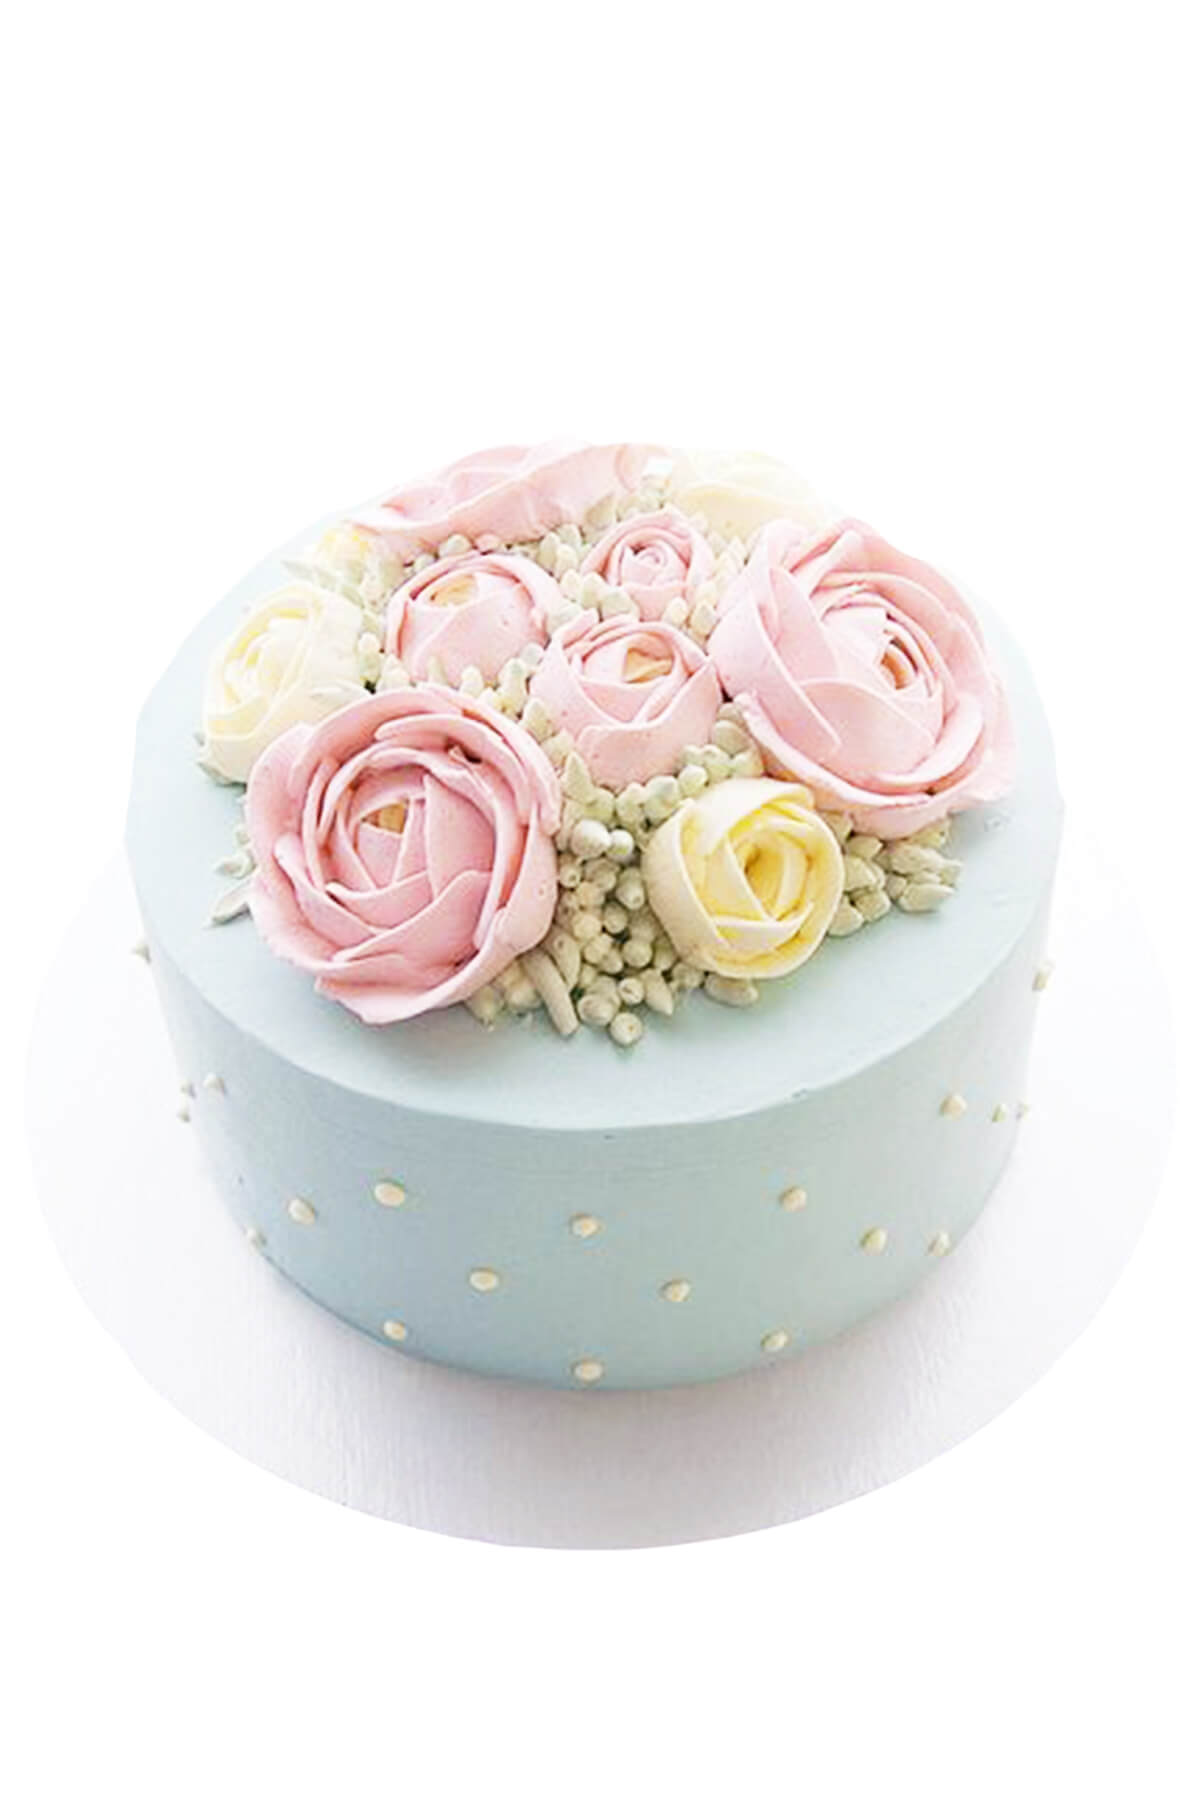 bánh kem hoa màu pastel